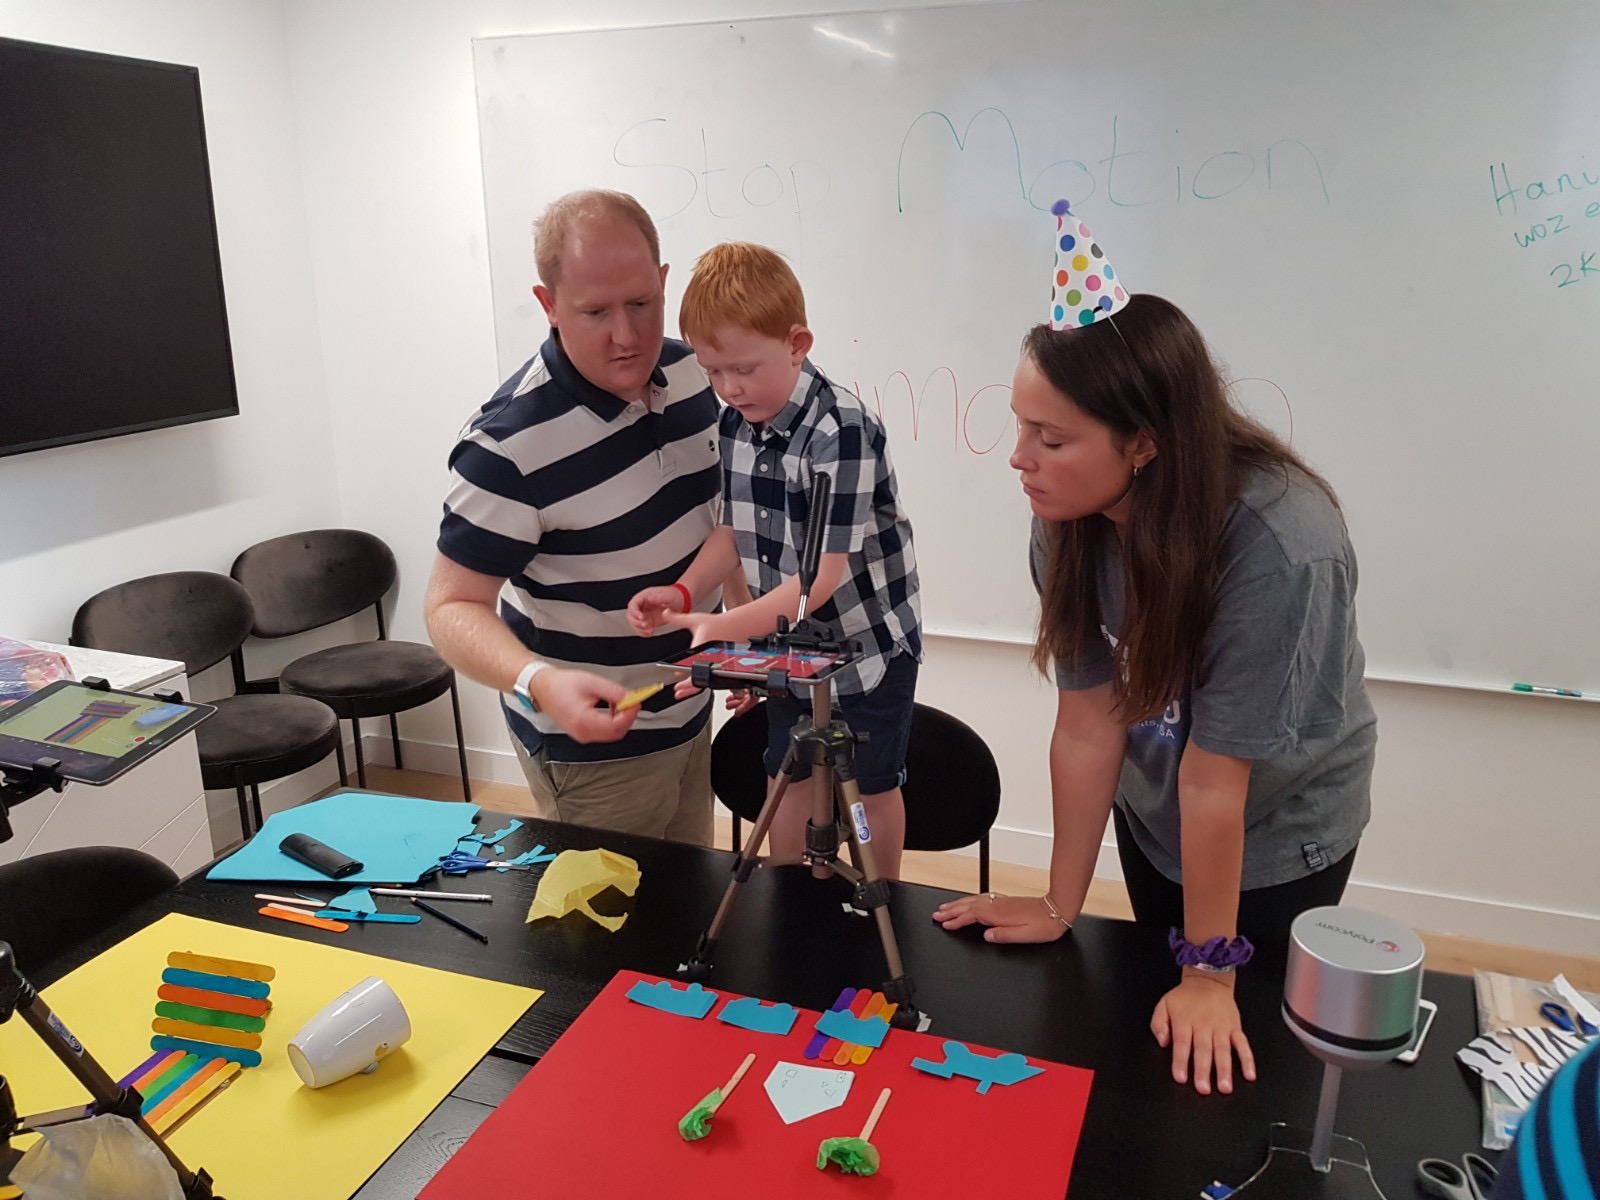 DMW's family day & National STEM/STEAM day 2019